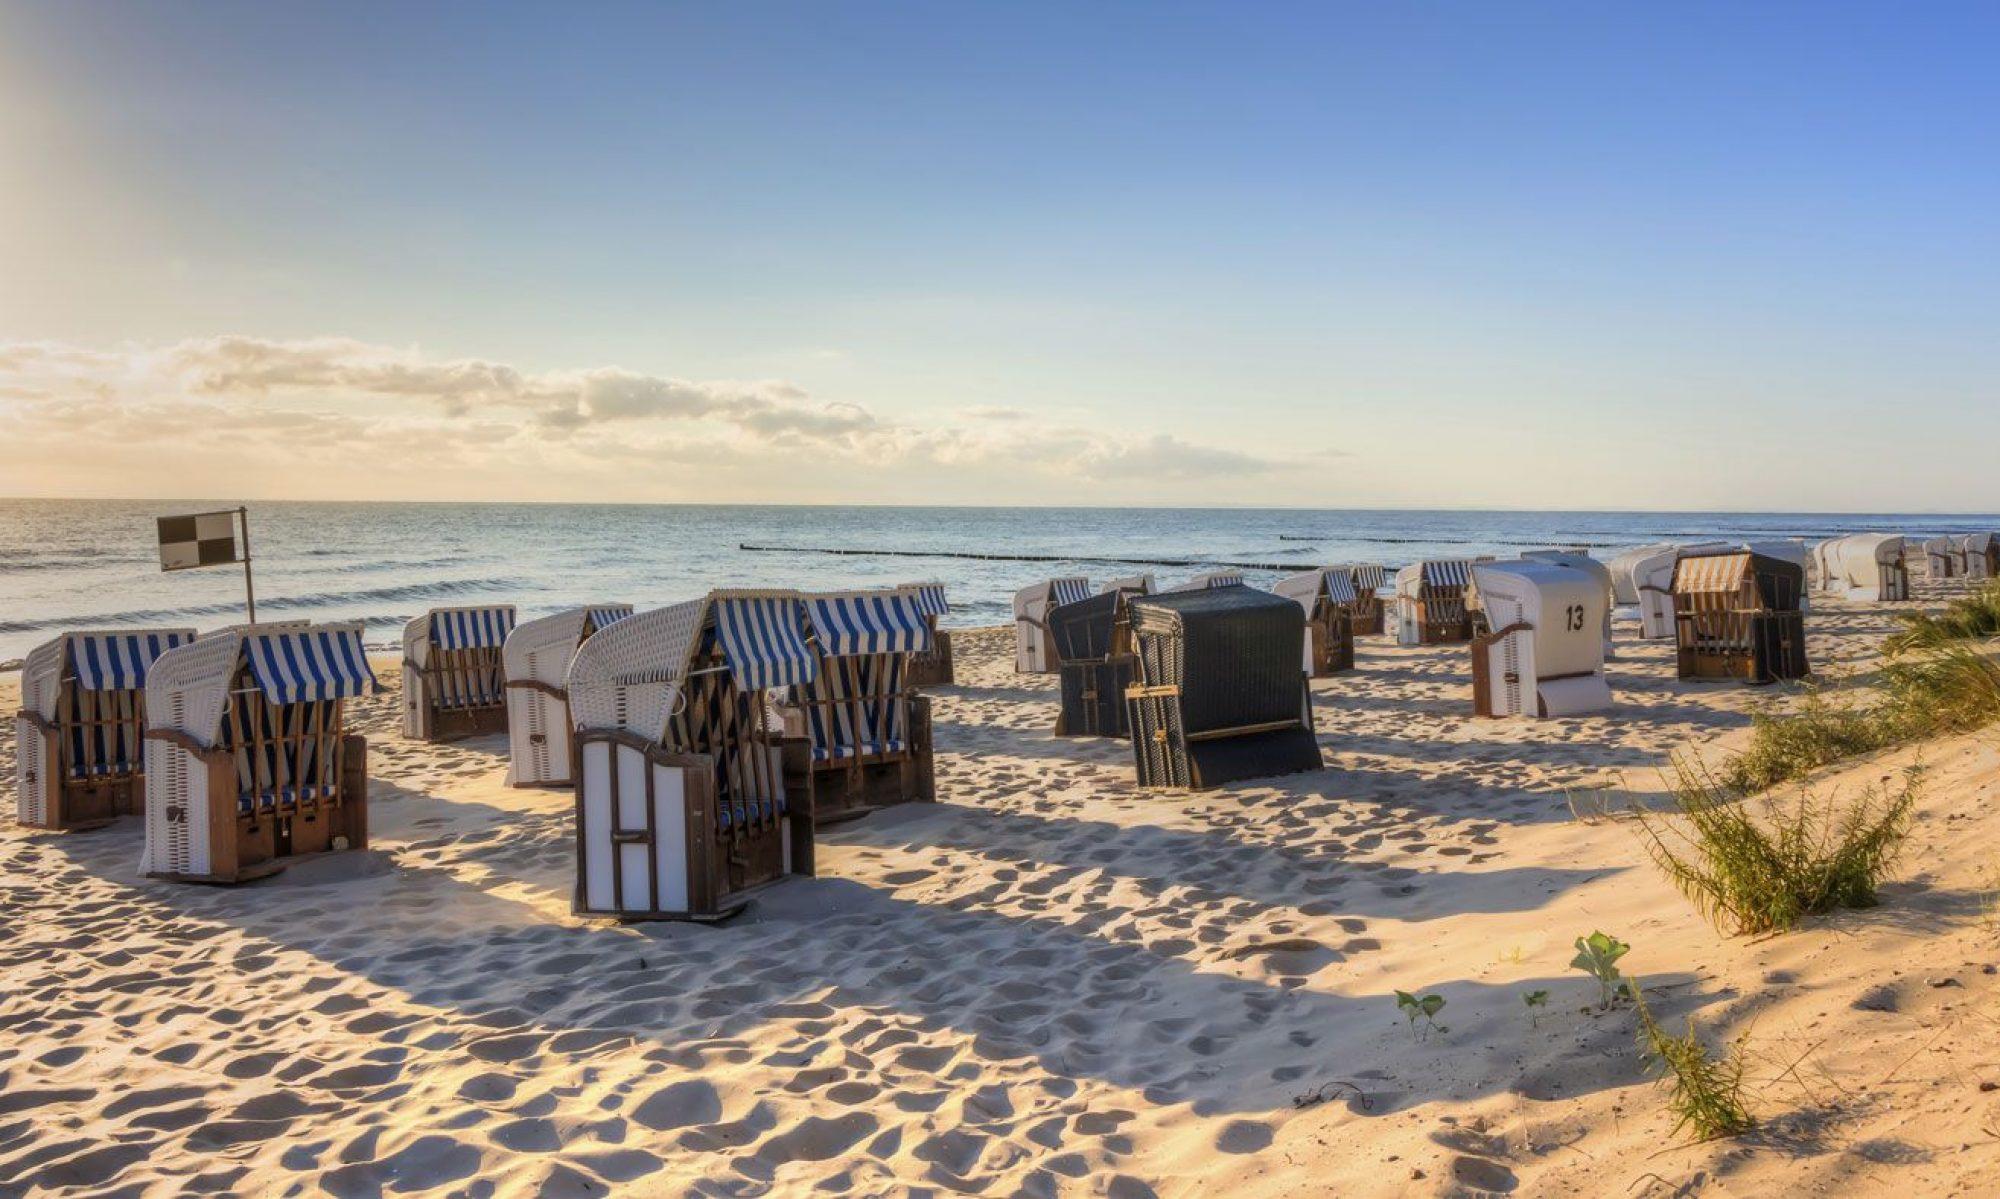 strandurlaub-kolberg.de